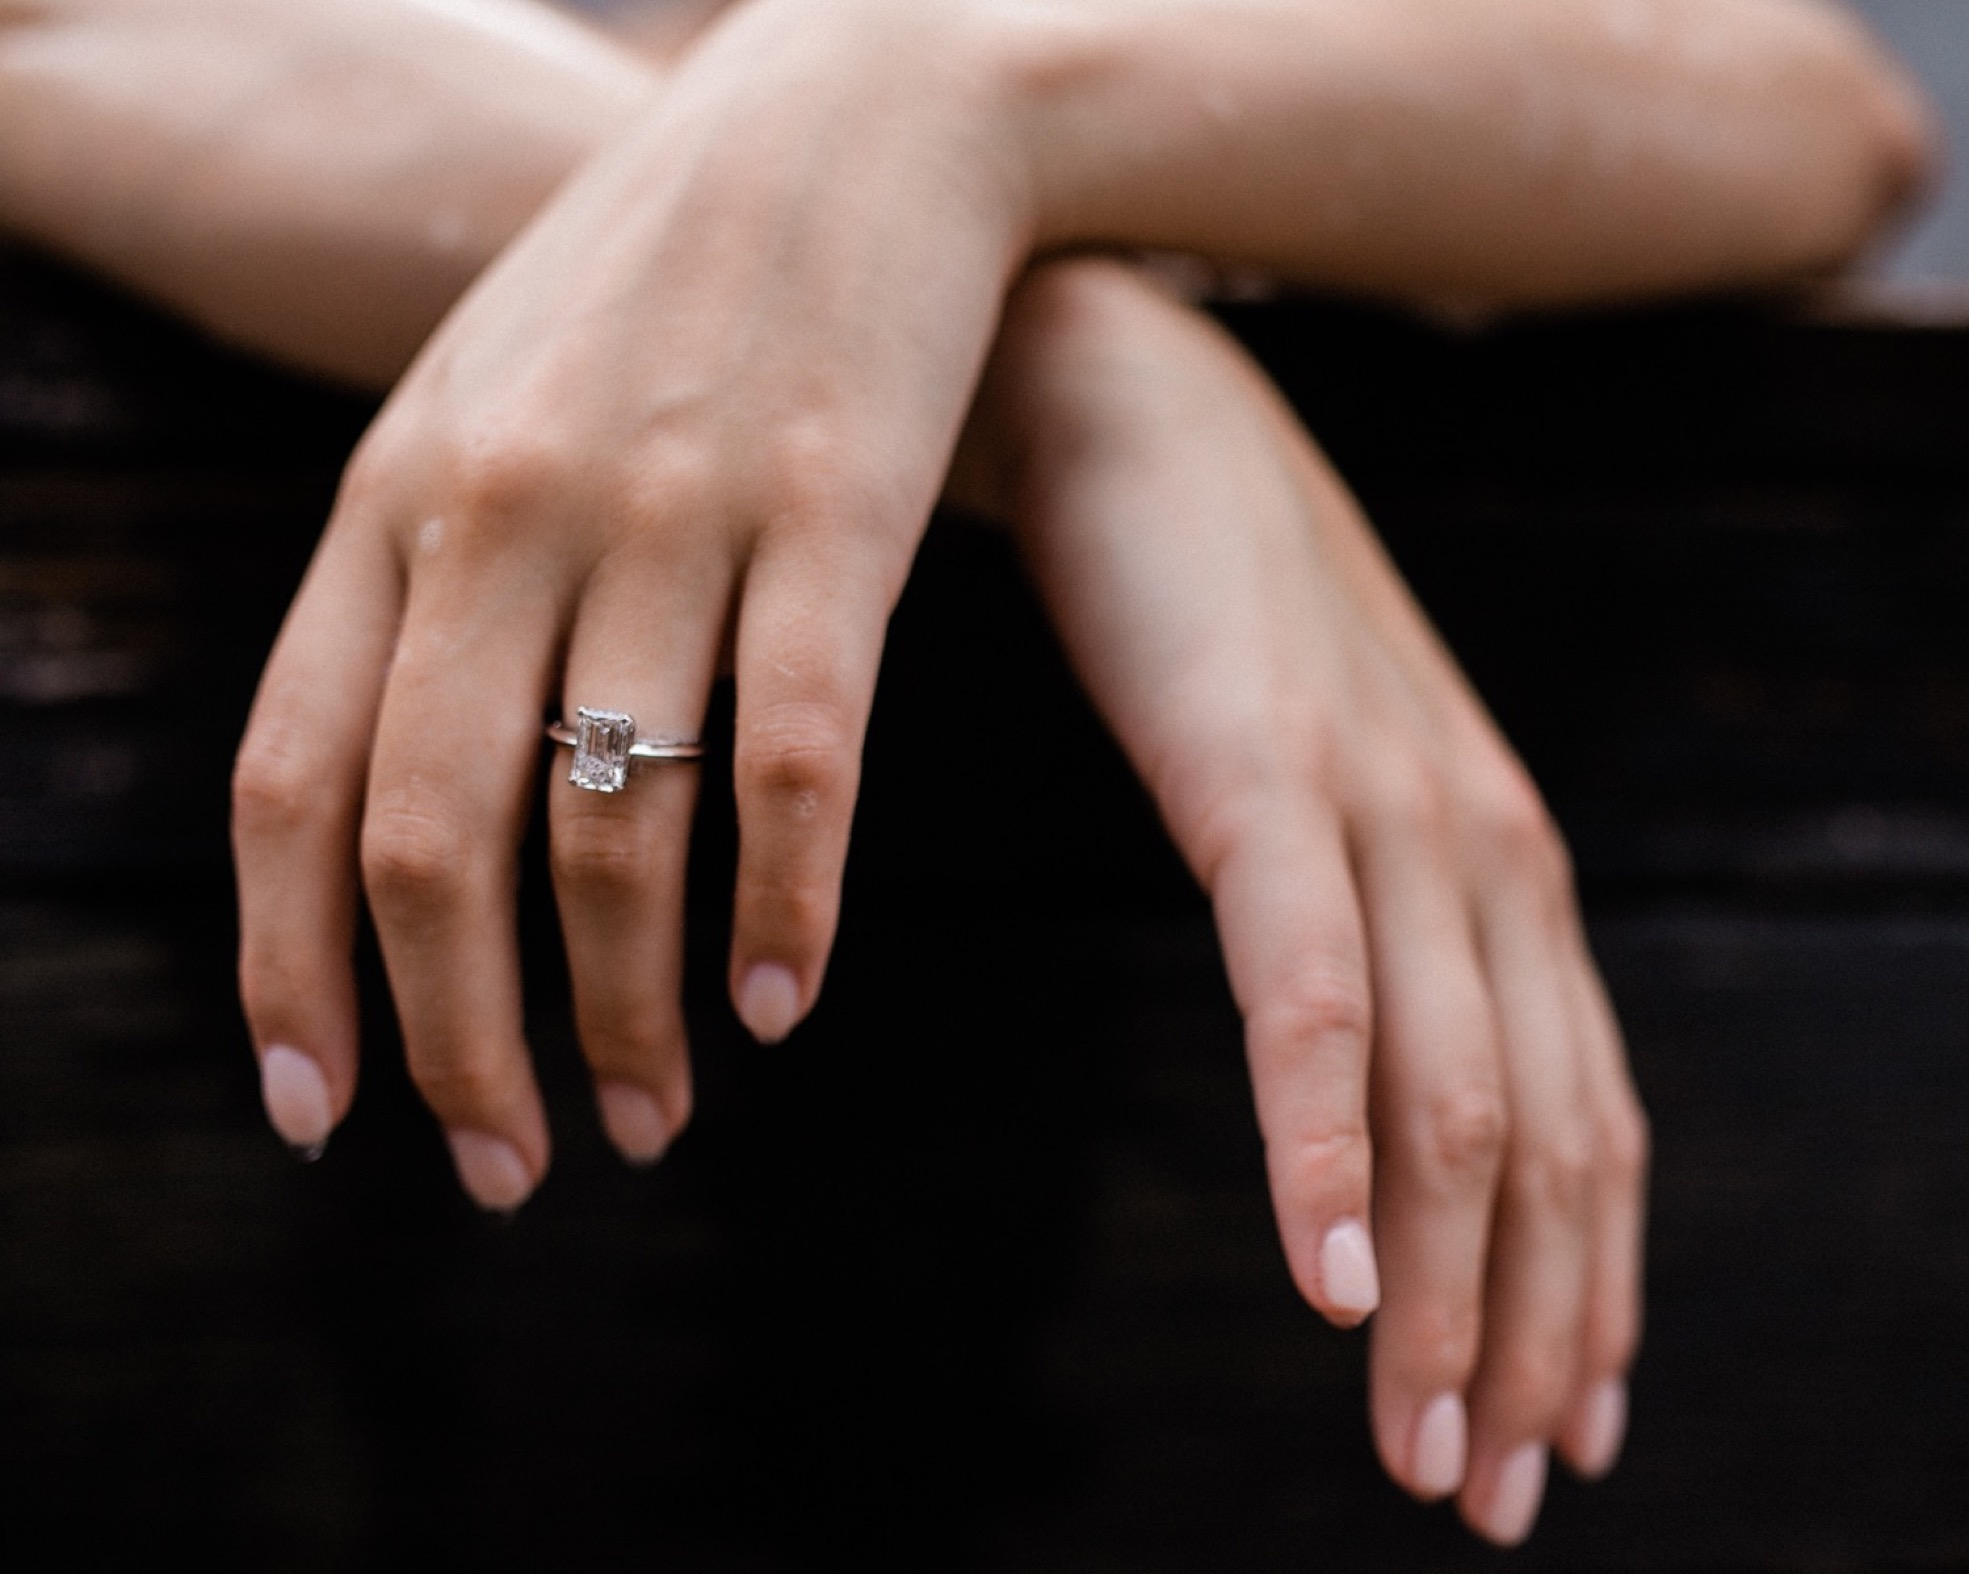 26_Marfa-Texas-Engagement-Jessica-Sherrell-151.jpg